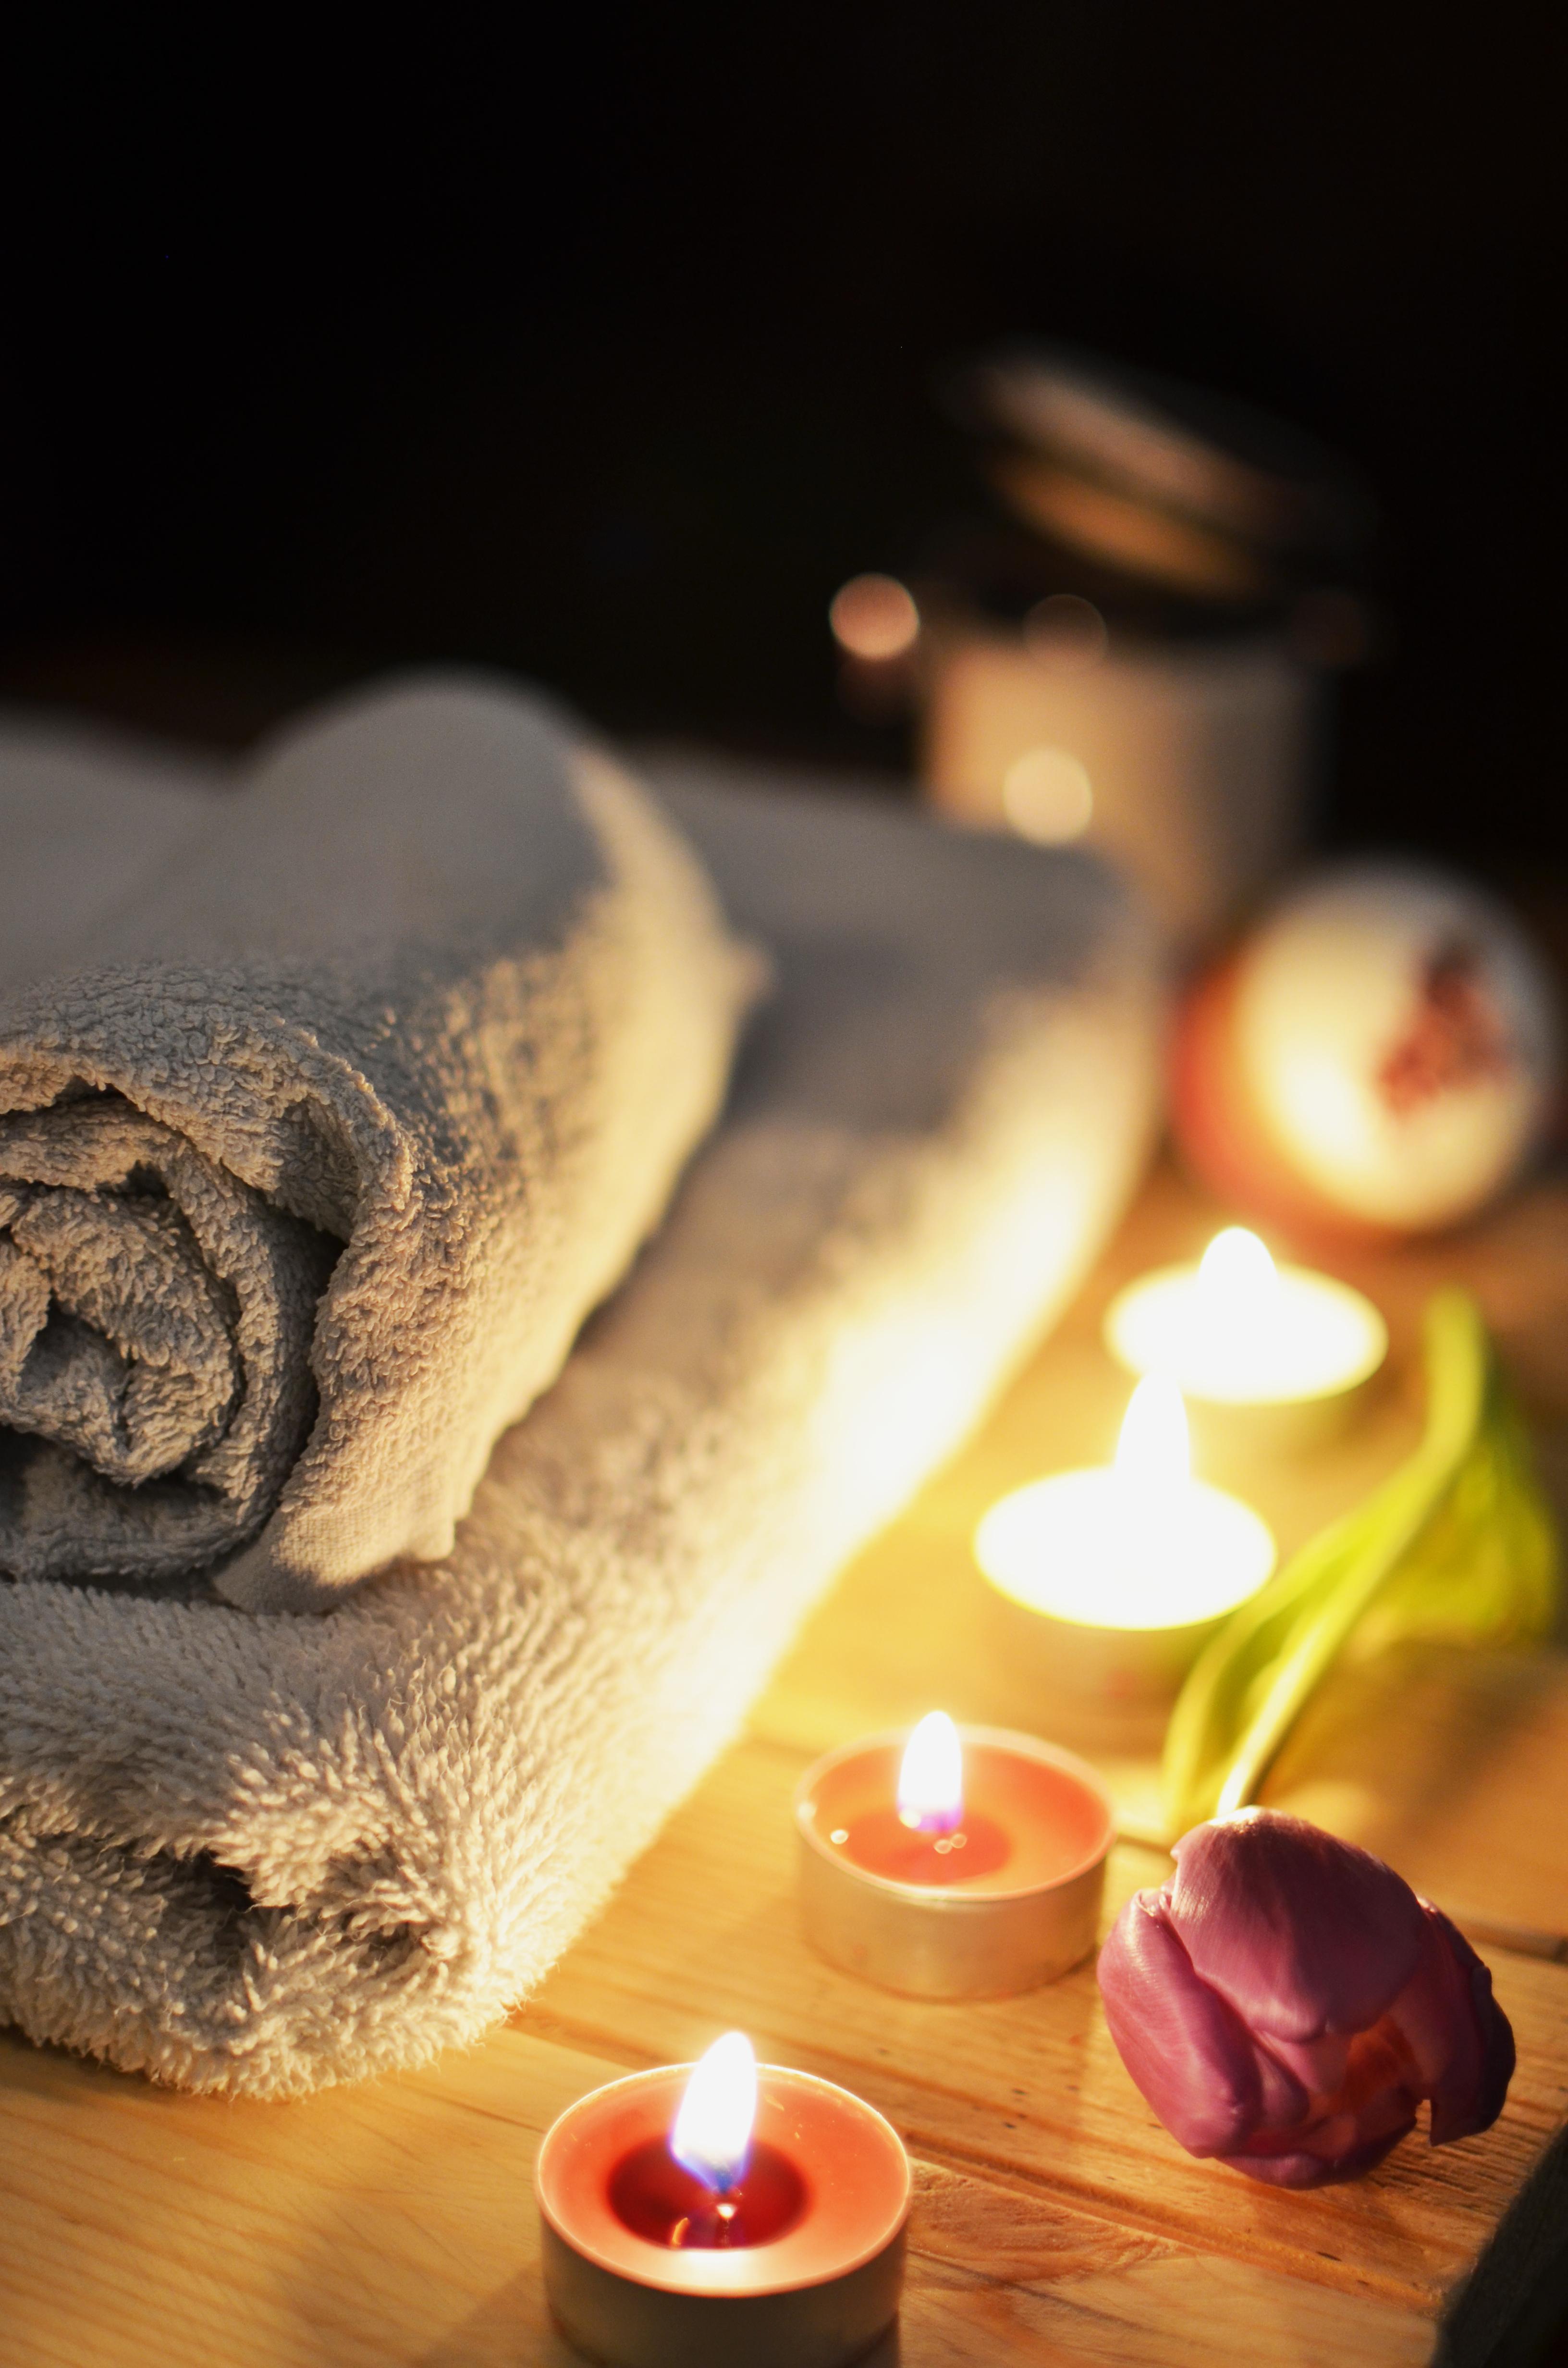 Flower Rose Romance Romantic Candle Lighting Bathroom Candles Spa Towels  Bath Candlelight Sweetness Wellness